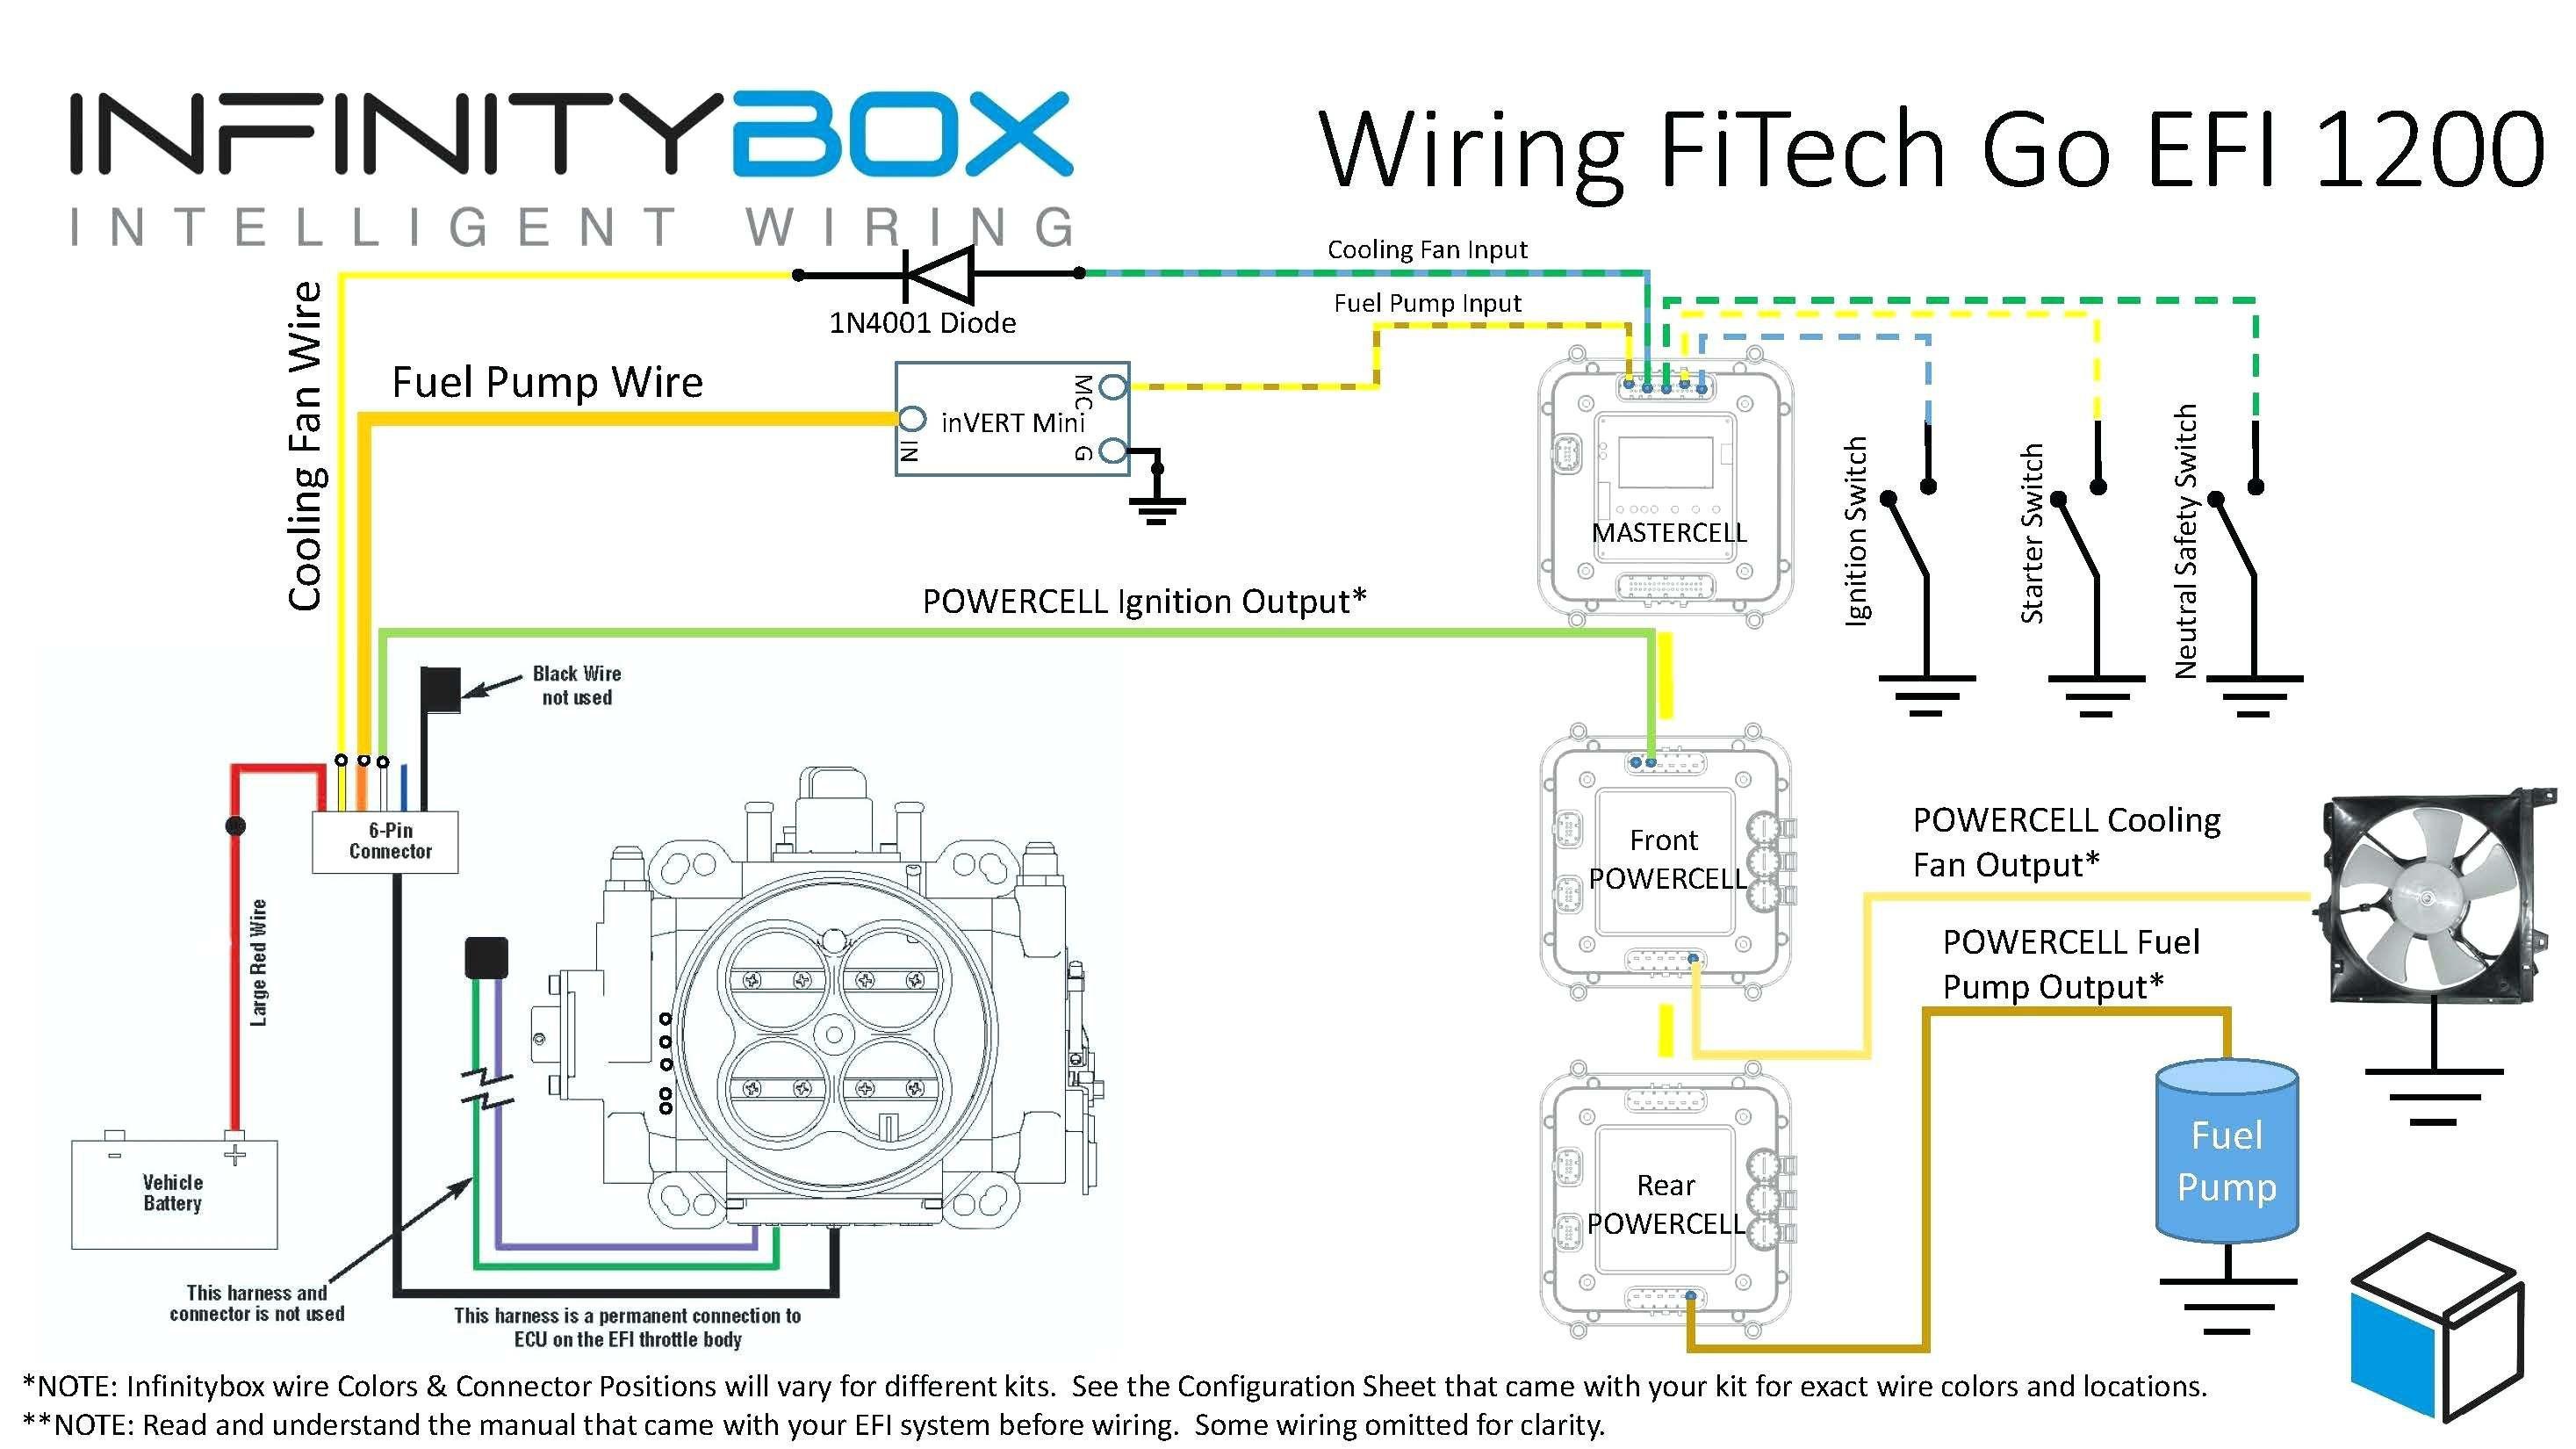 20 Amp Twist Lock Plug Wiring Diagram - Shahsramblings - 50 Amp Plug Wiring Diagram